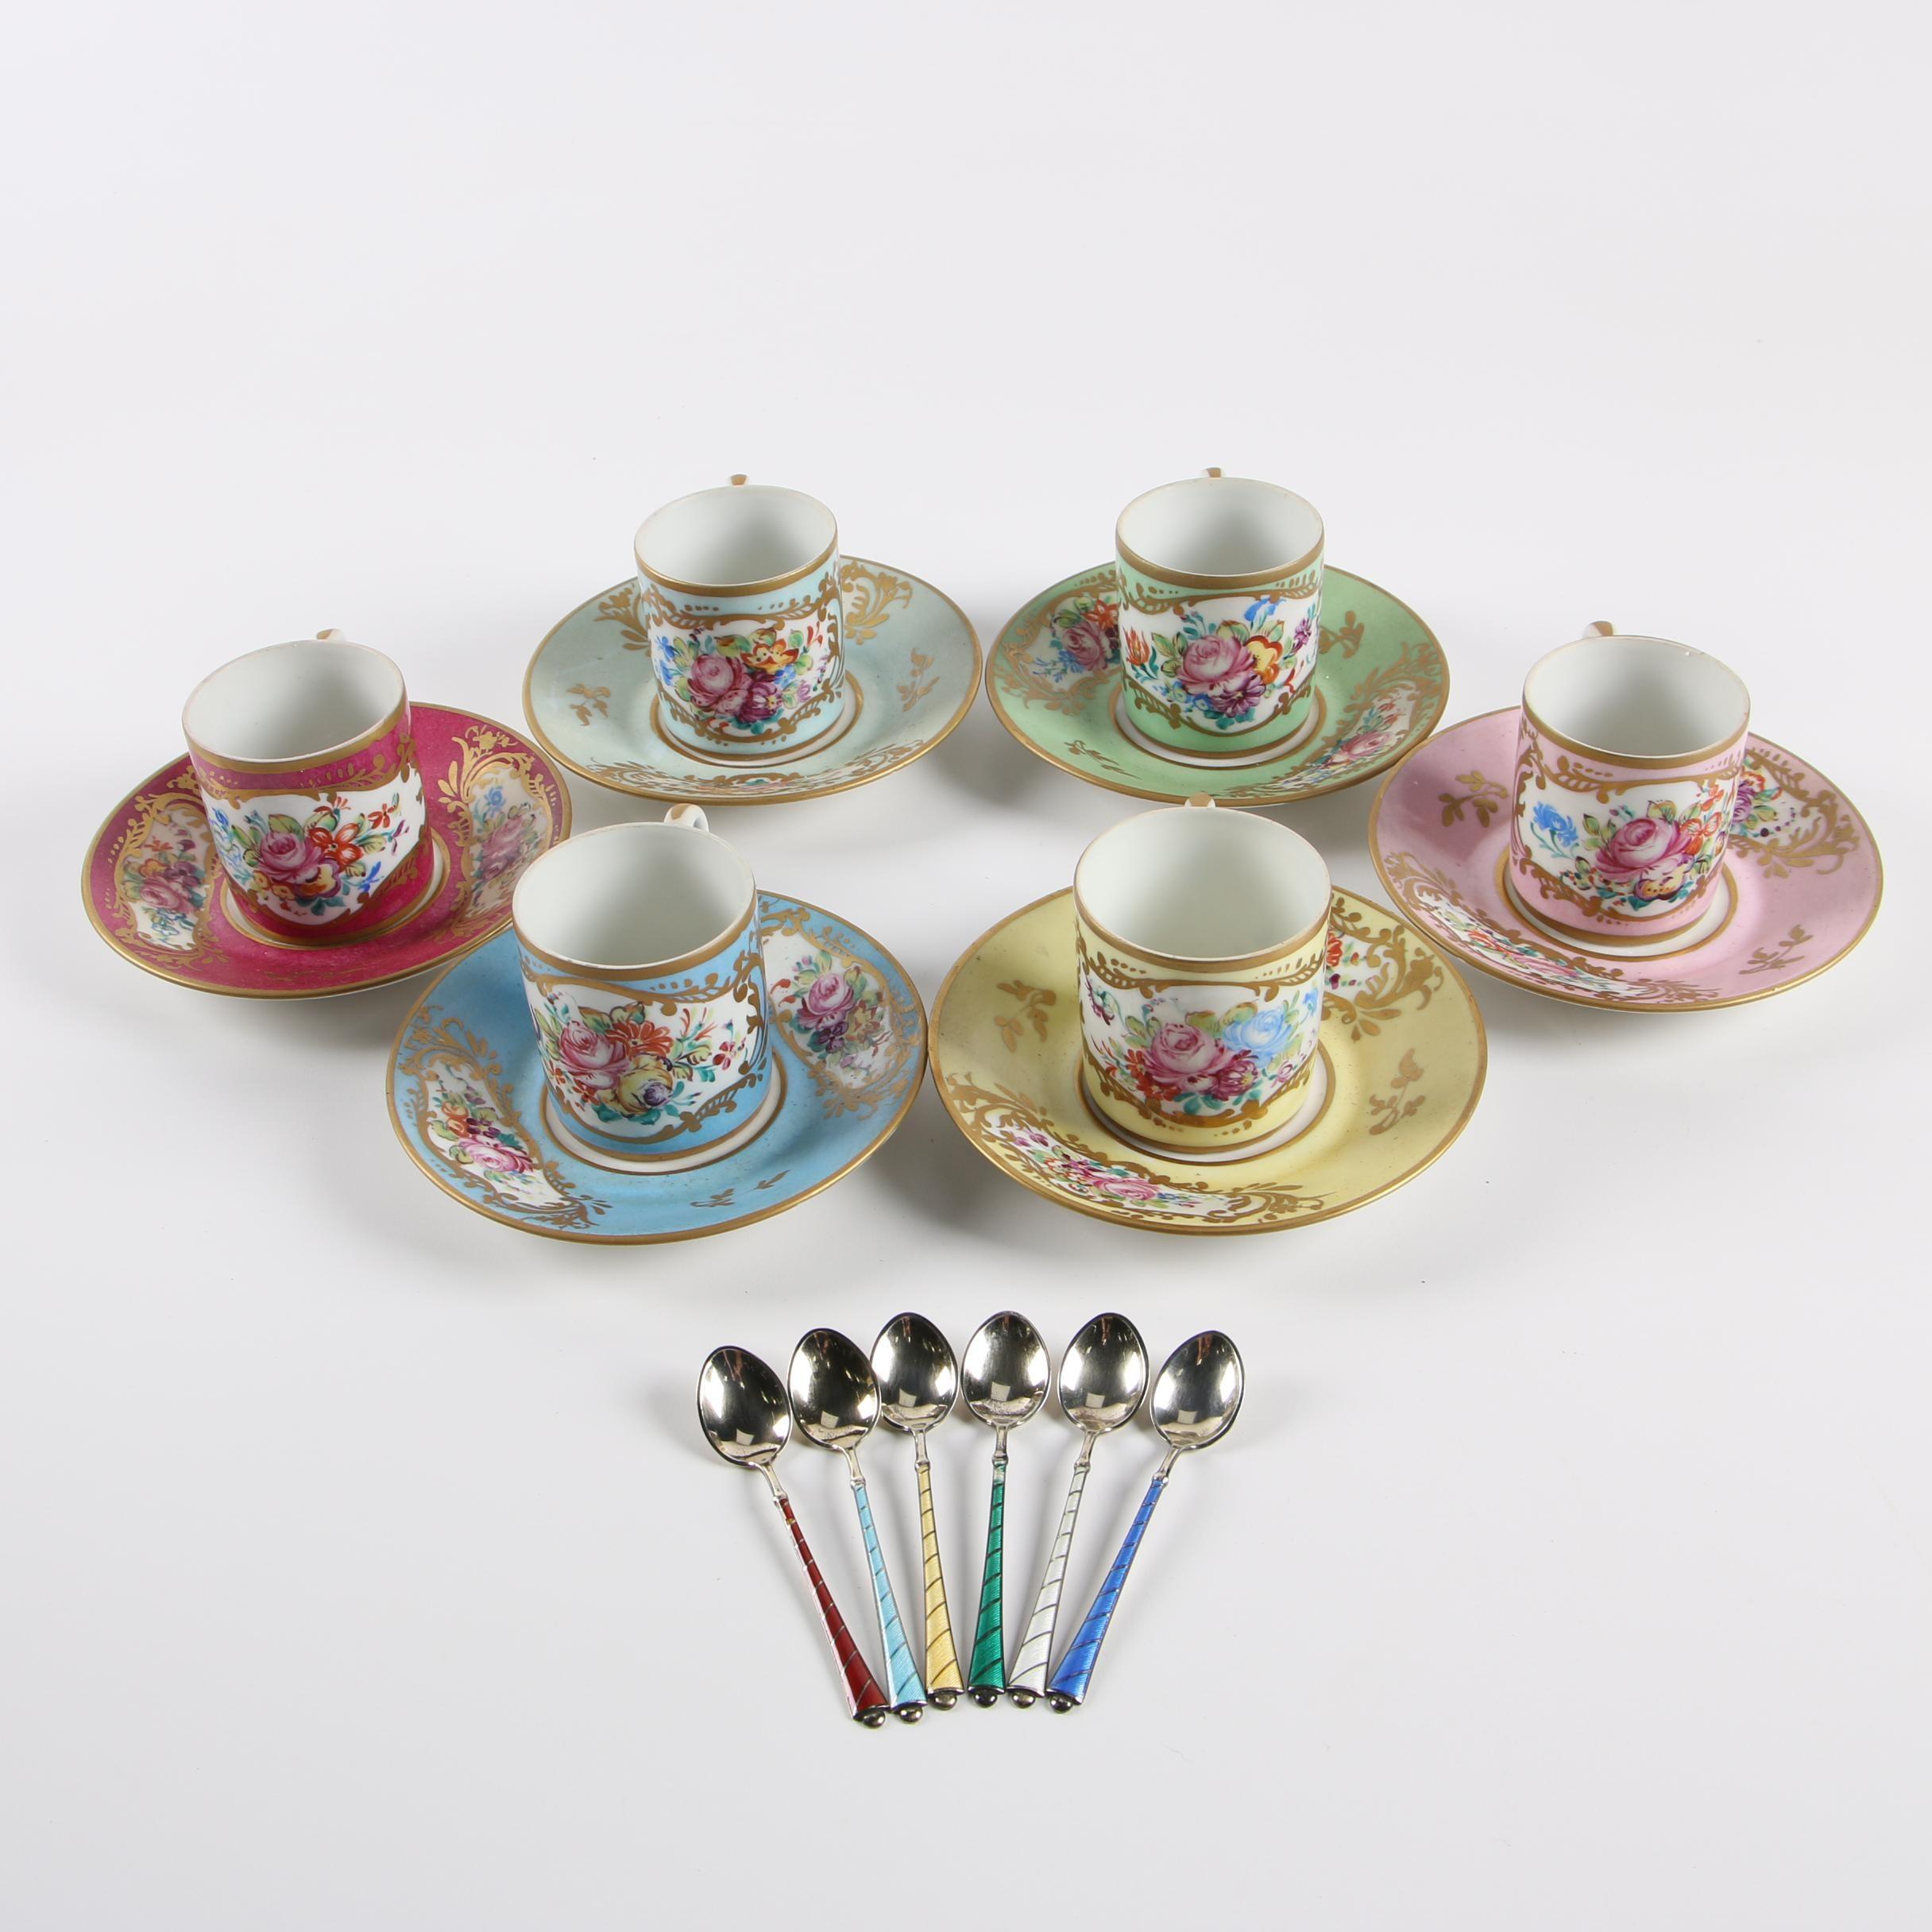 Limoges Sevres Style Demitasse Cup Sets with Ela Danish Enameled Sterling Spoons